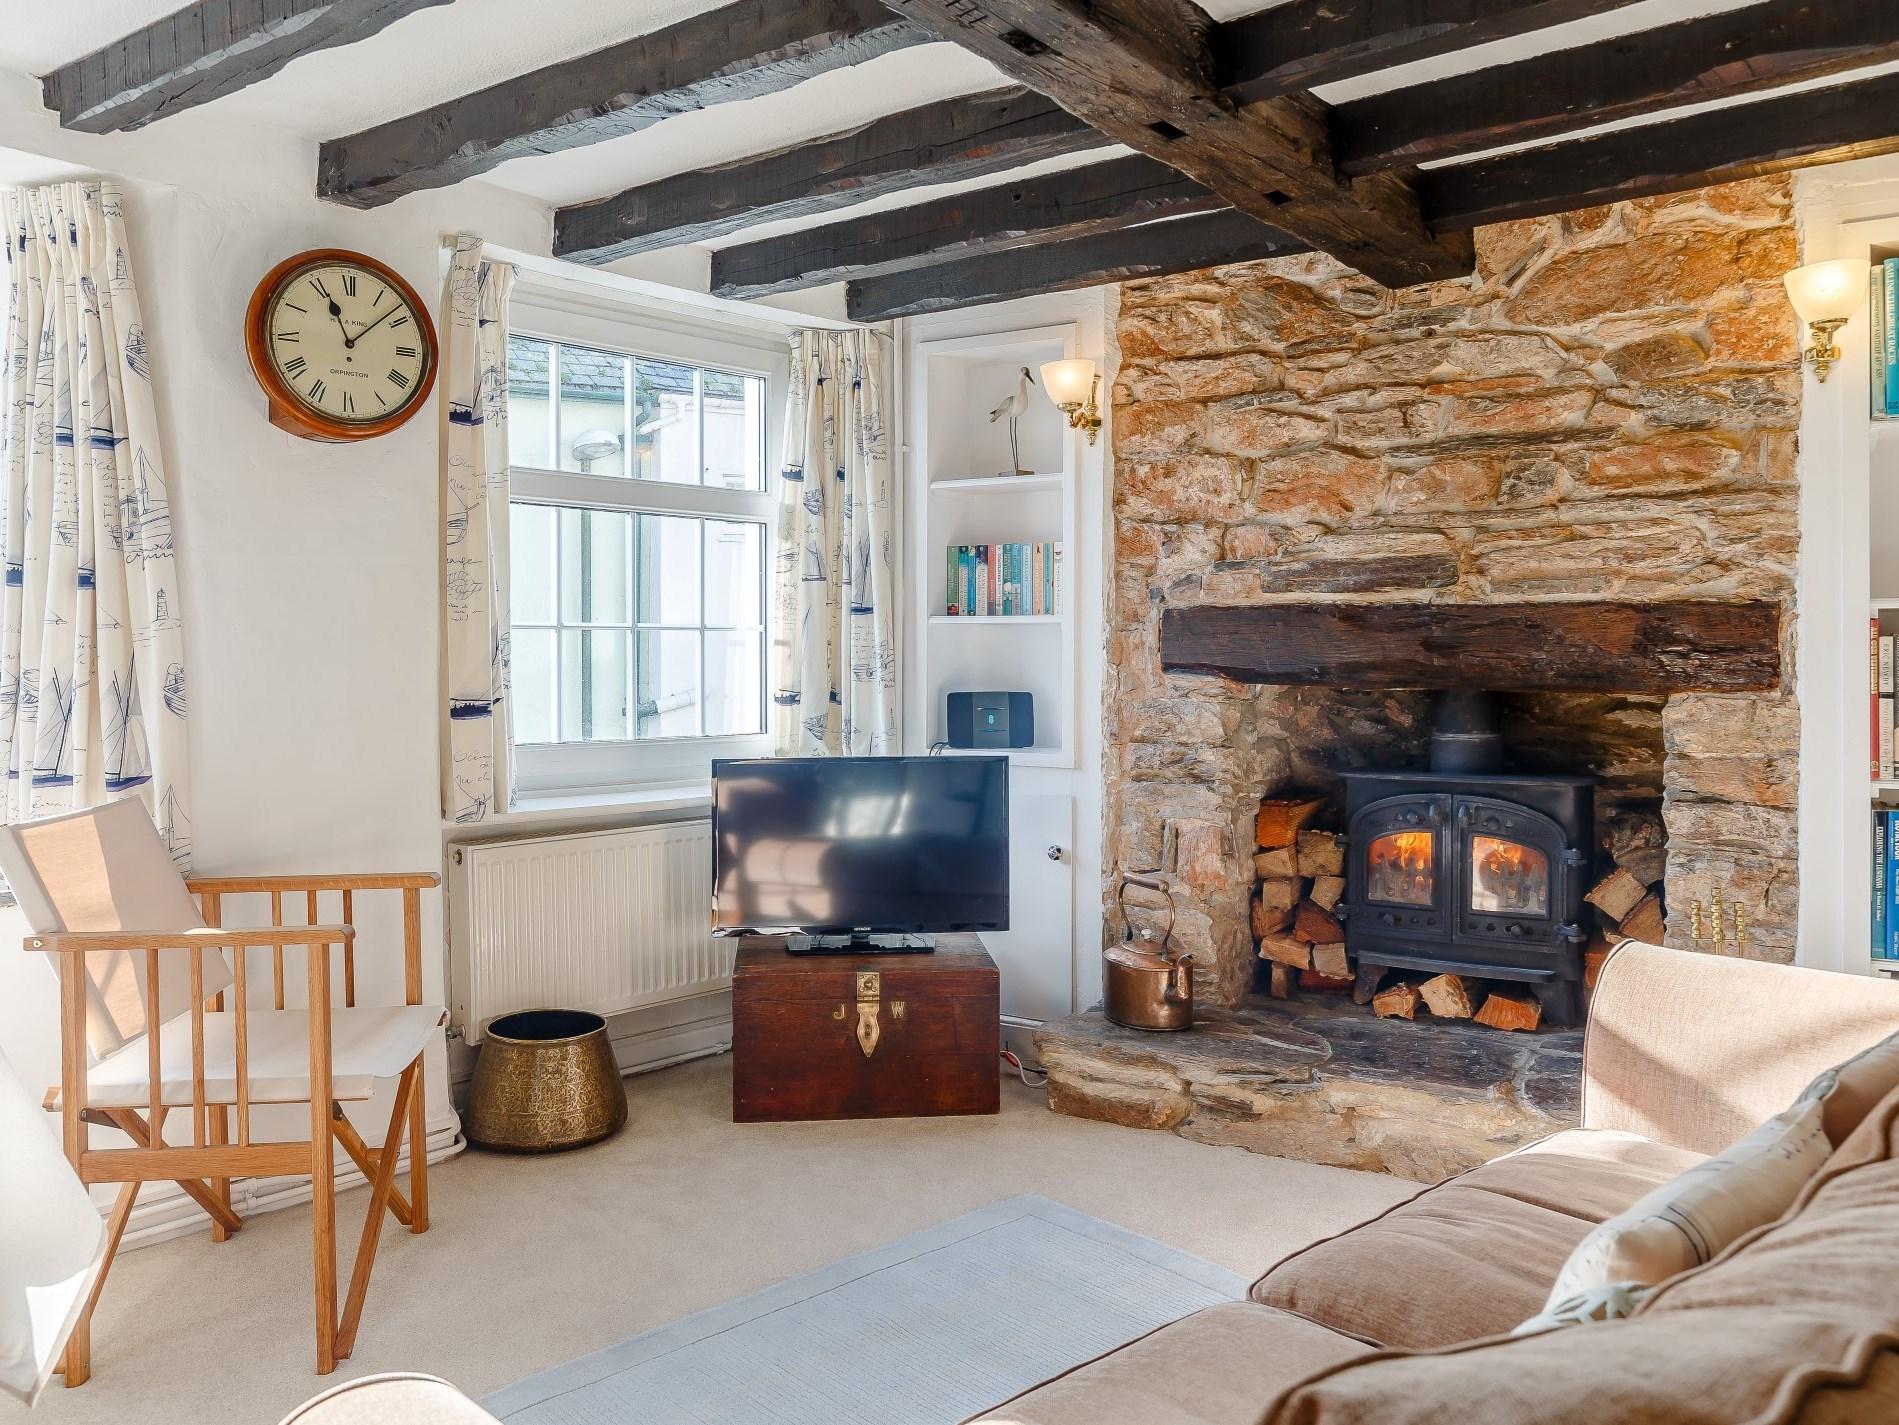 2 Bedroom Cottage in Brixham, Devon